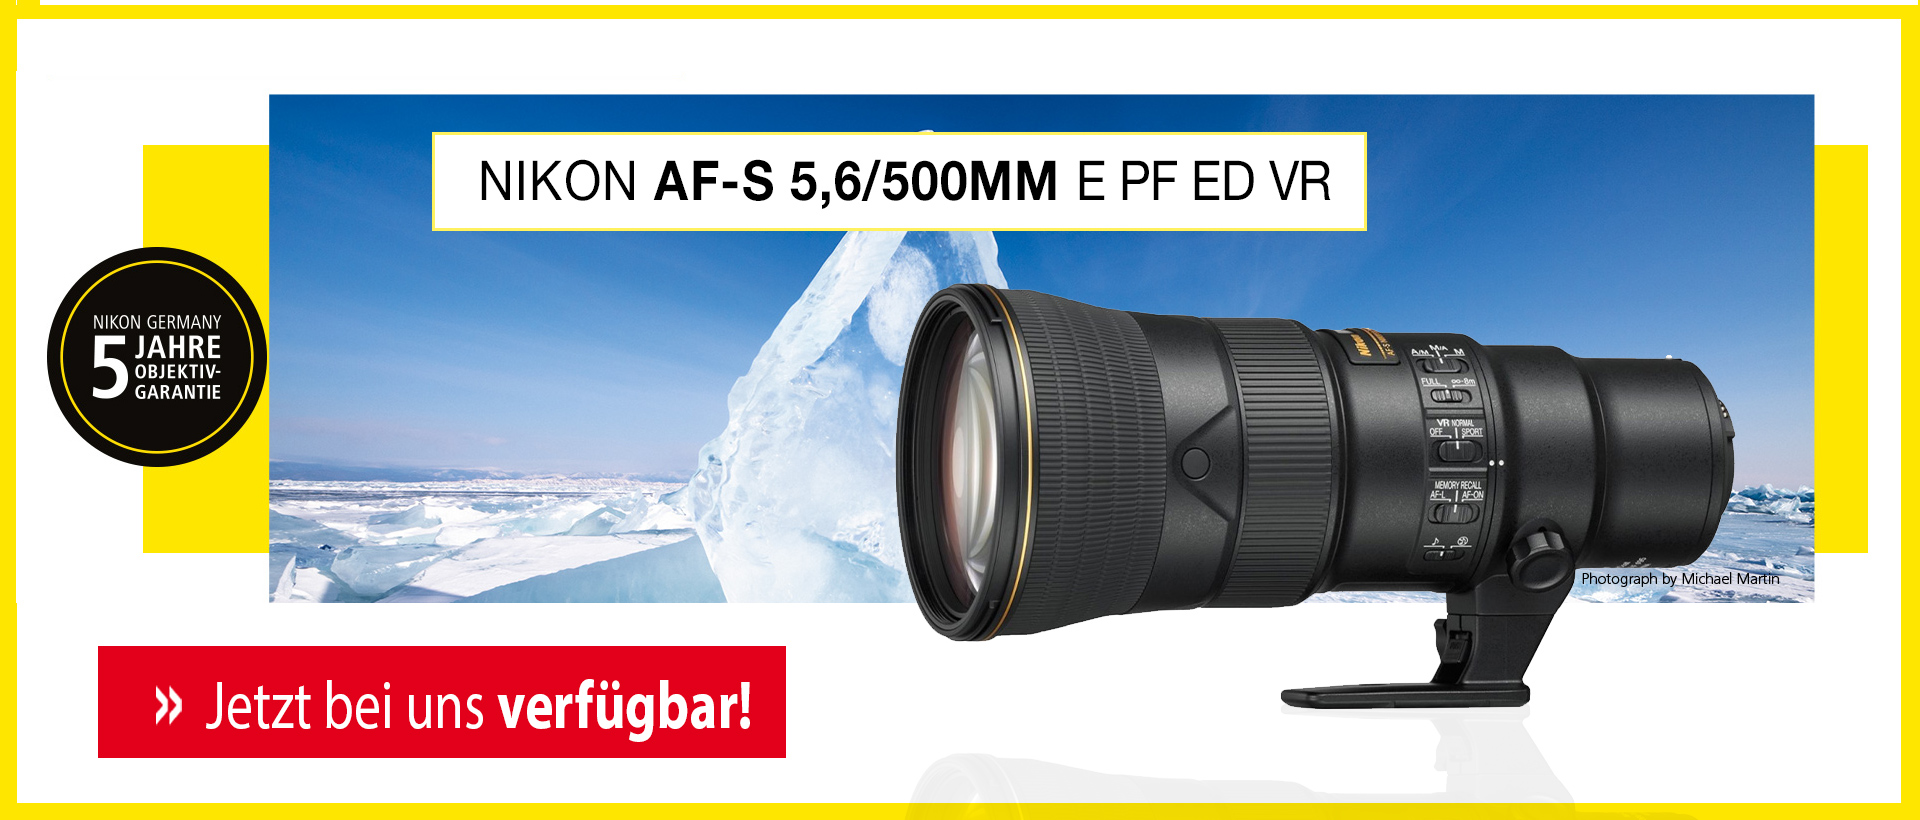 Nikon AF-S 5,6/500mm E PF ED VR + 5-Jahre-Garantie-Aktion